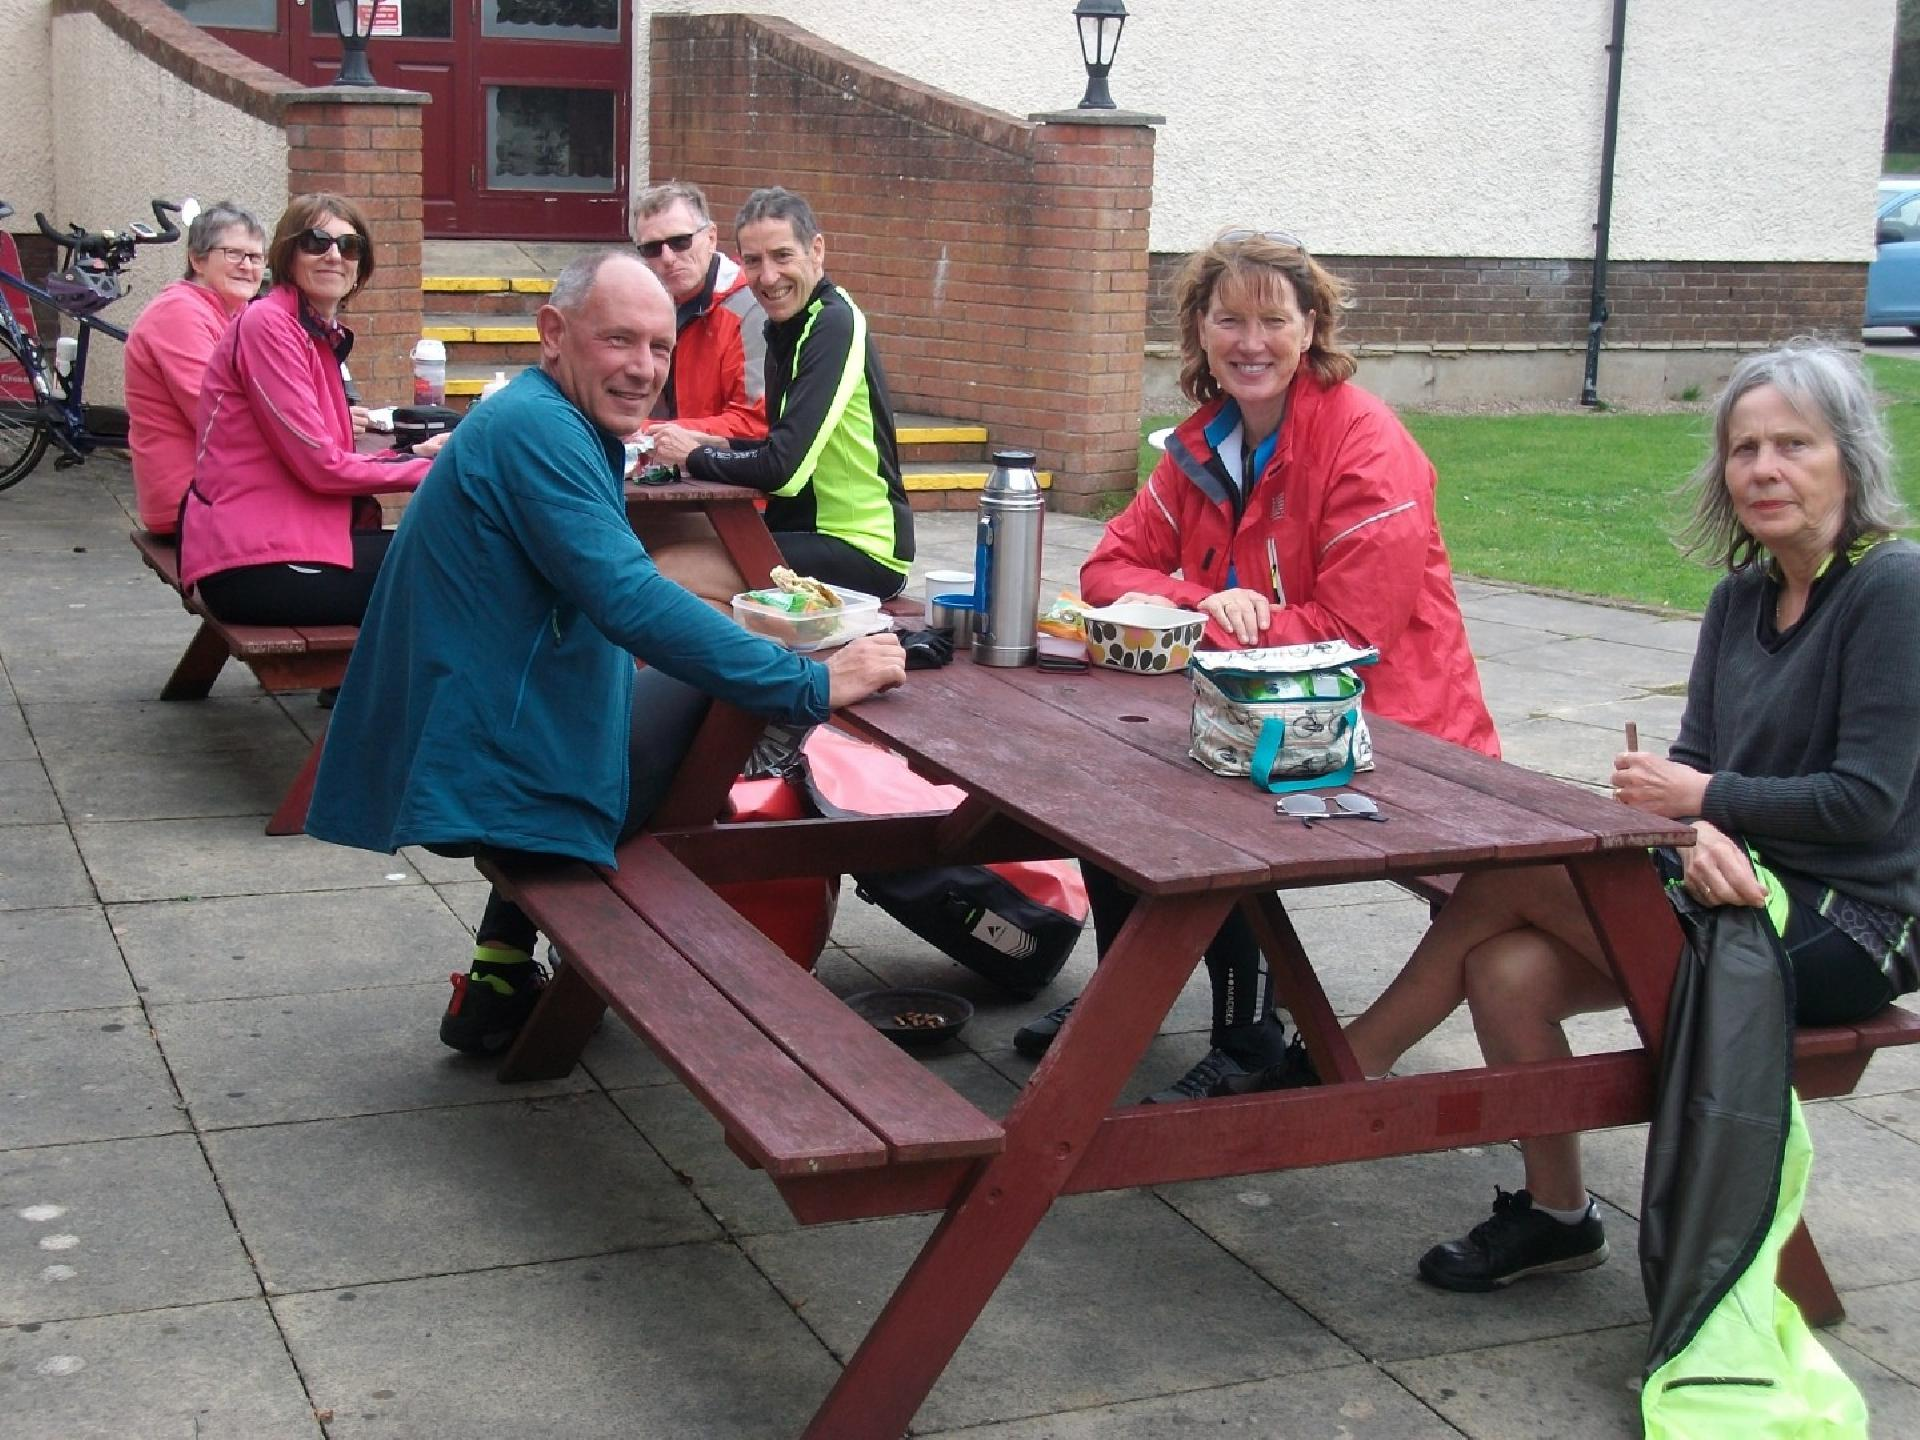 Enjoying a picnic lunch at Carnforth Truckhaven